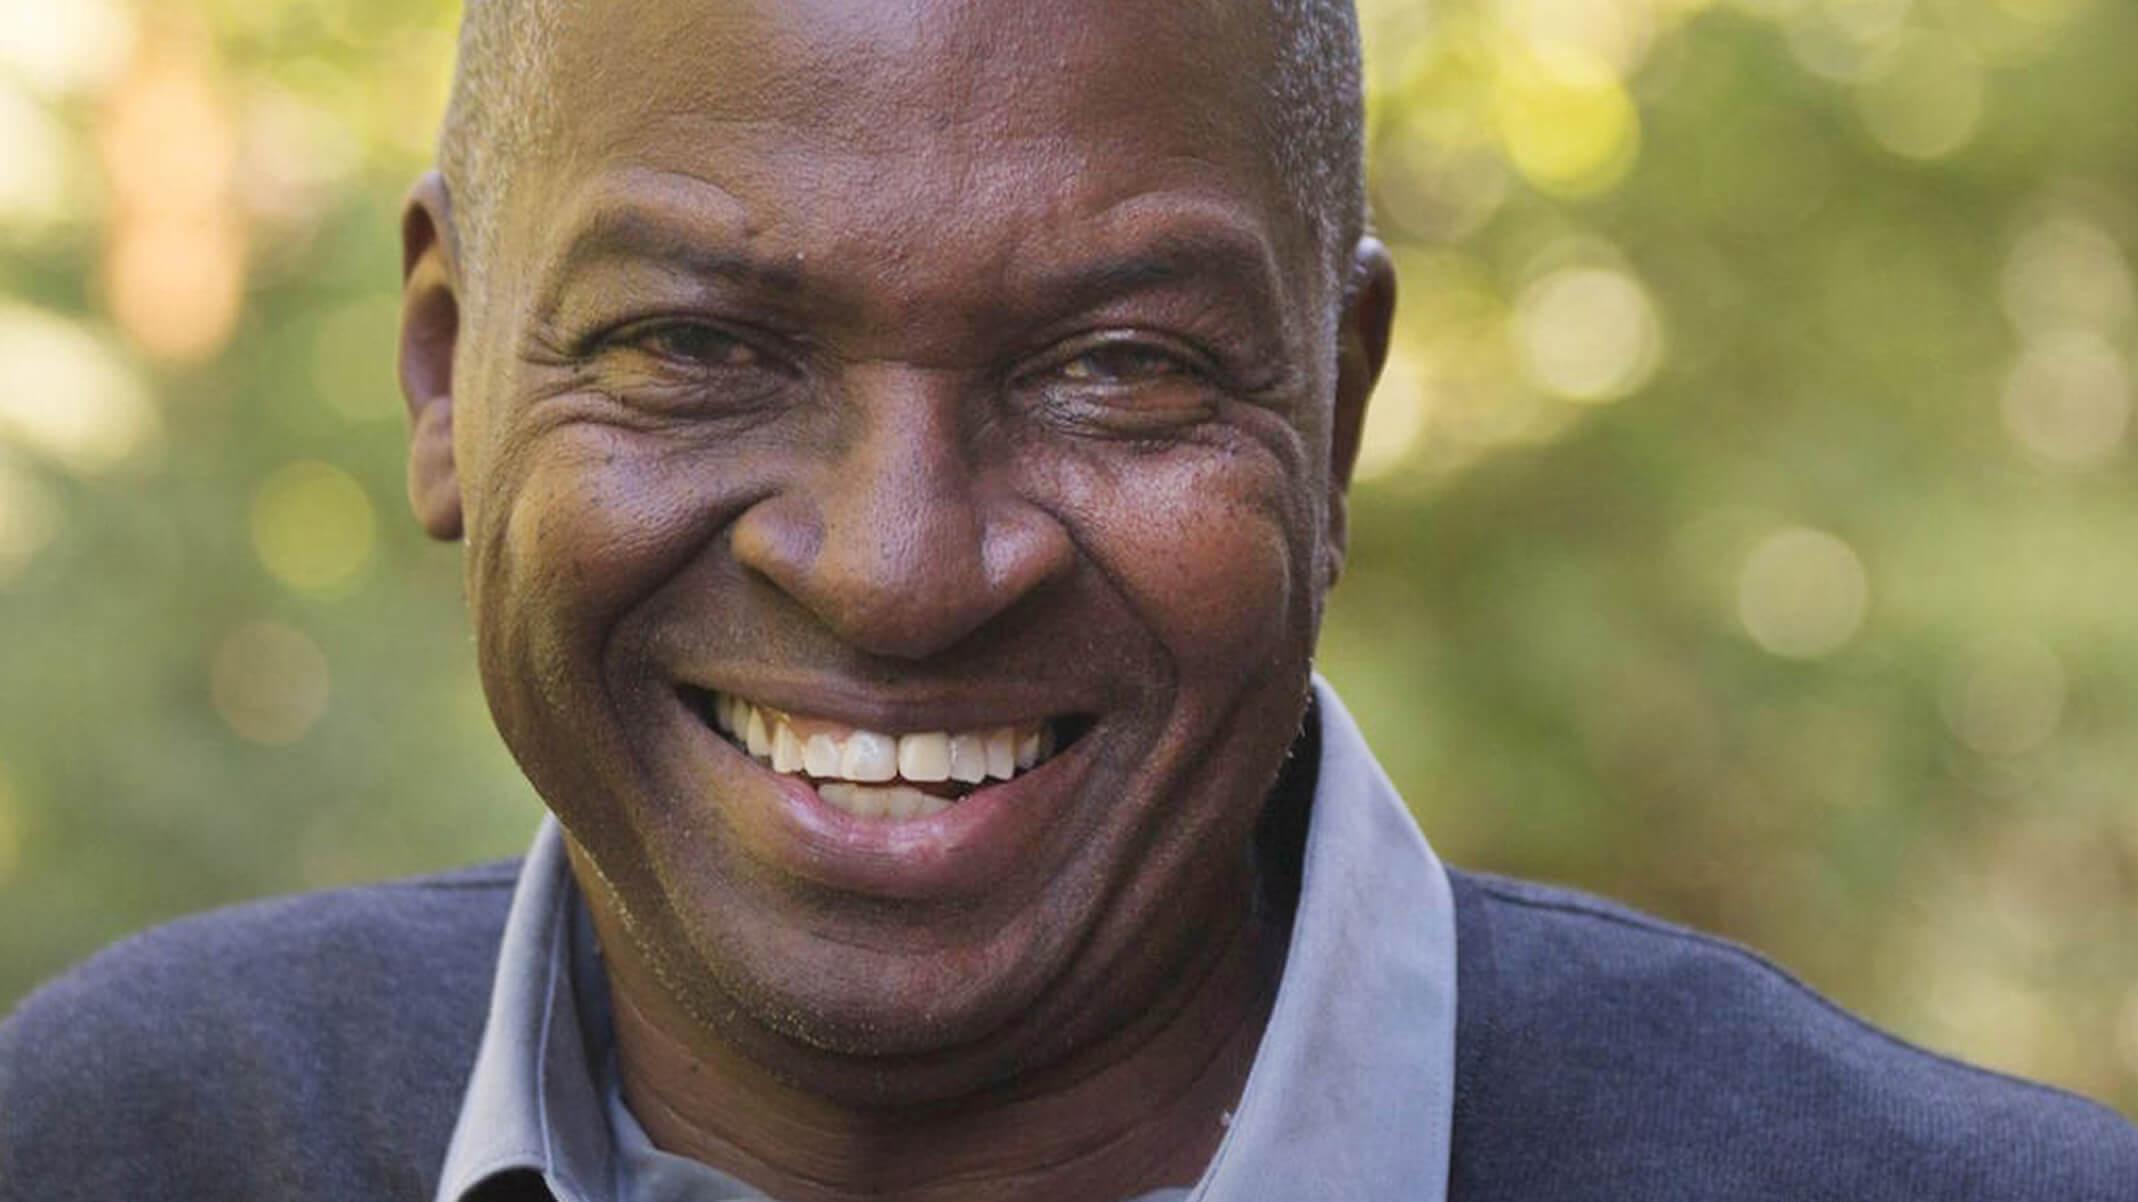 Kenny Johnson Smiling